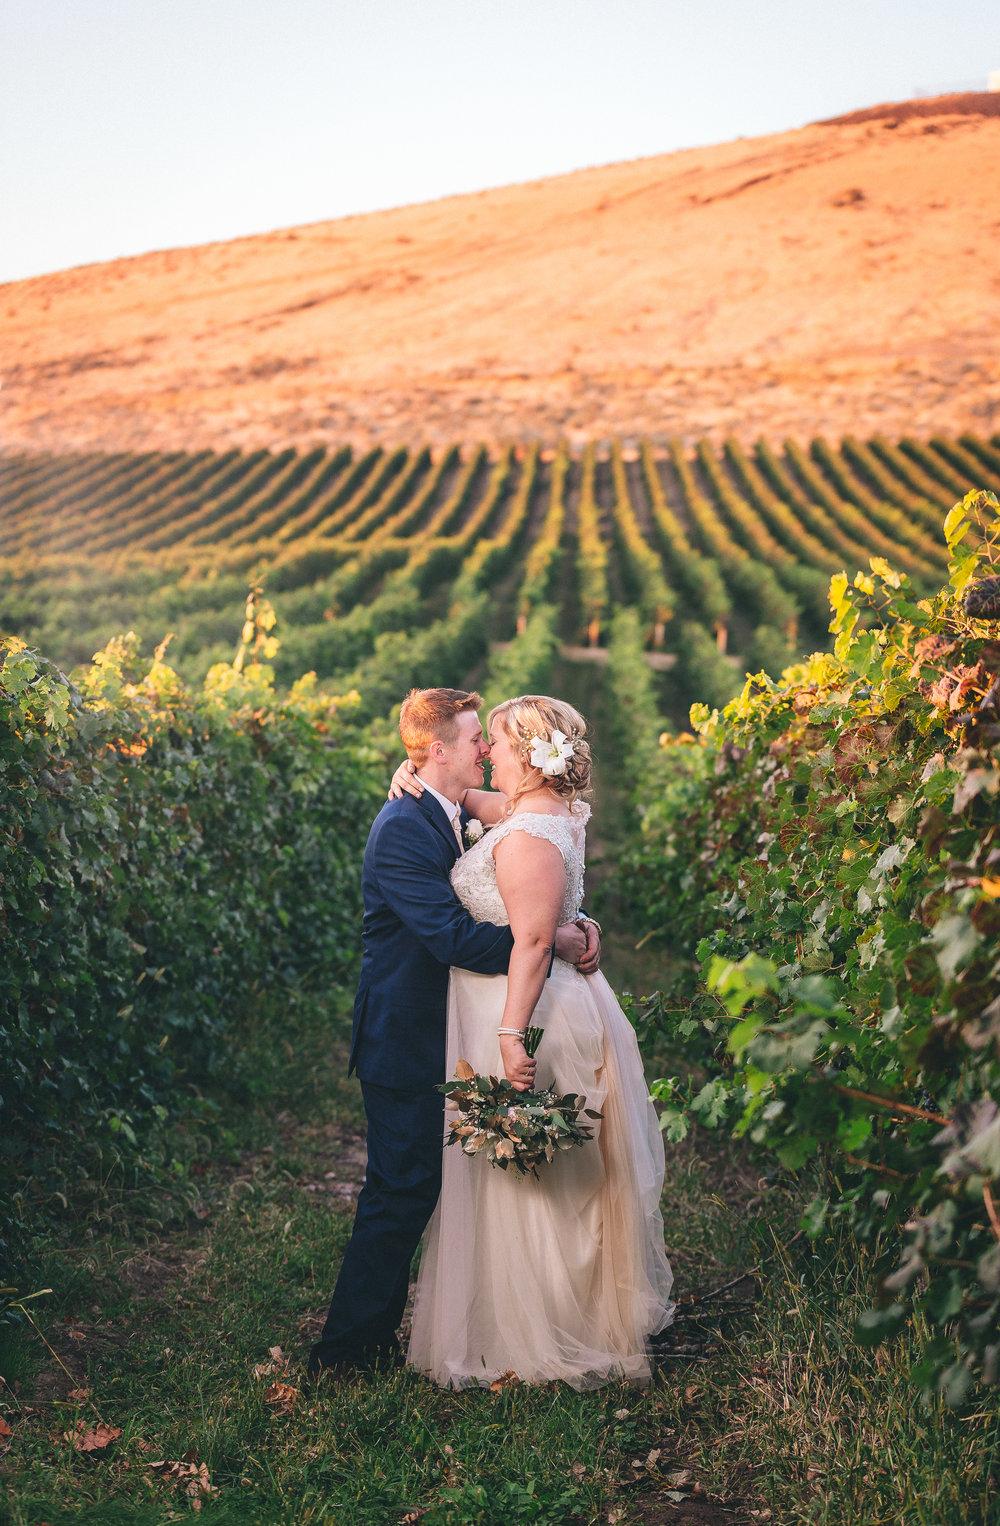 tri-cities powers winery wedding